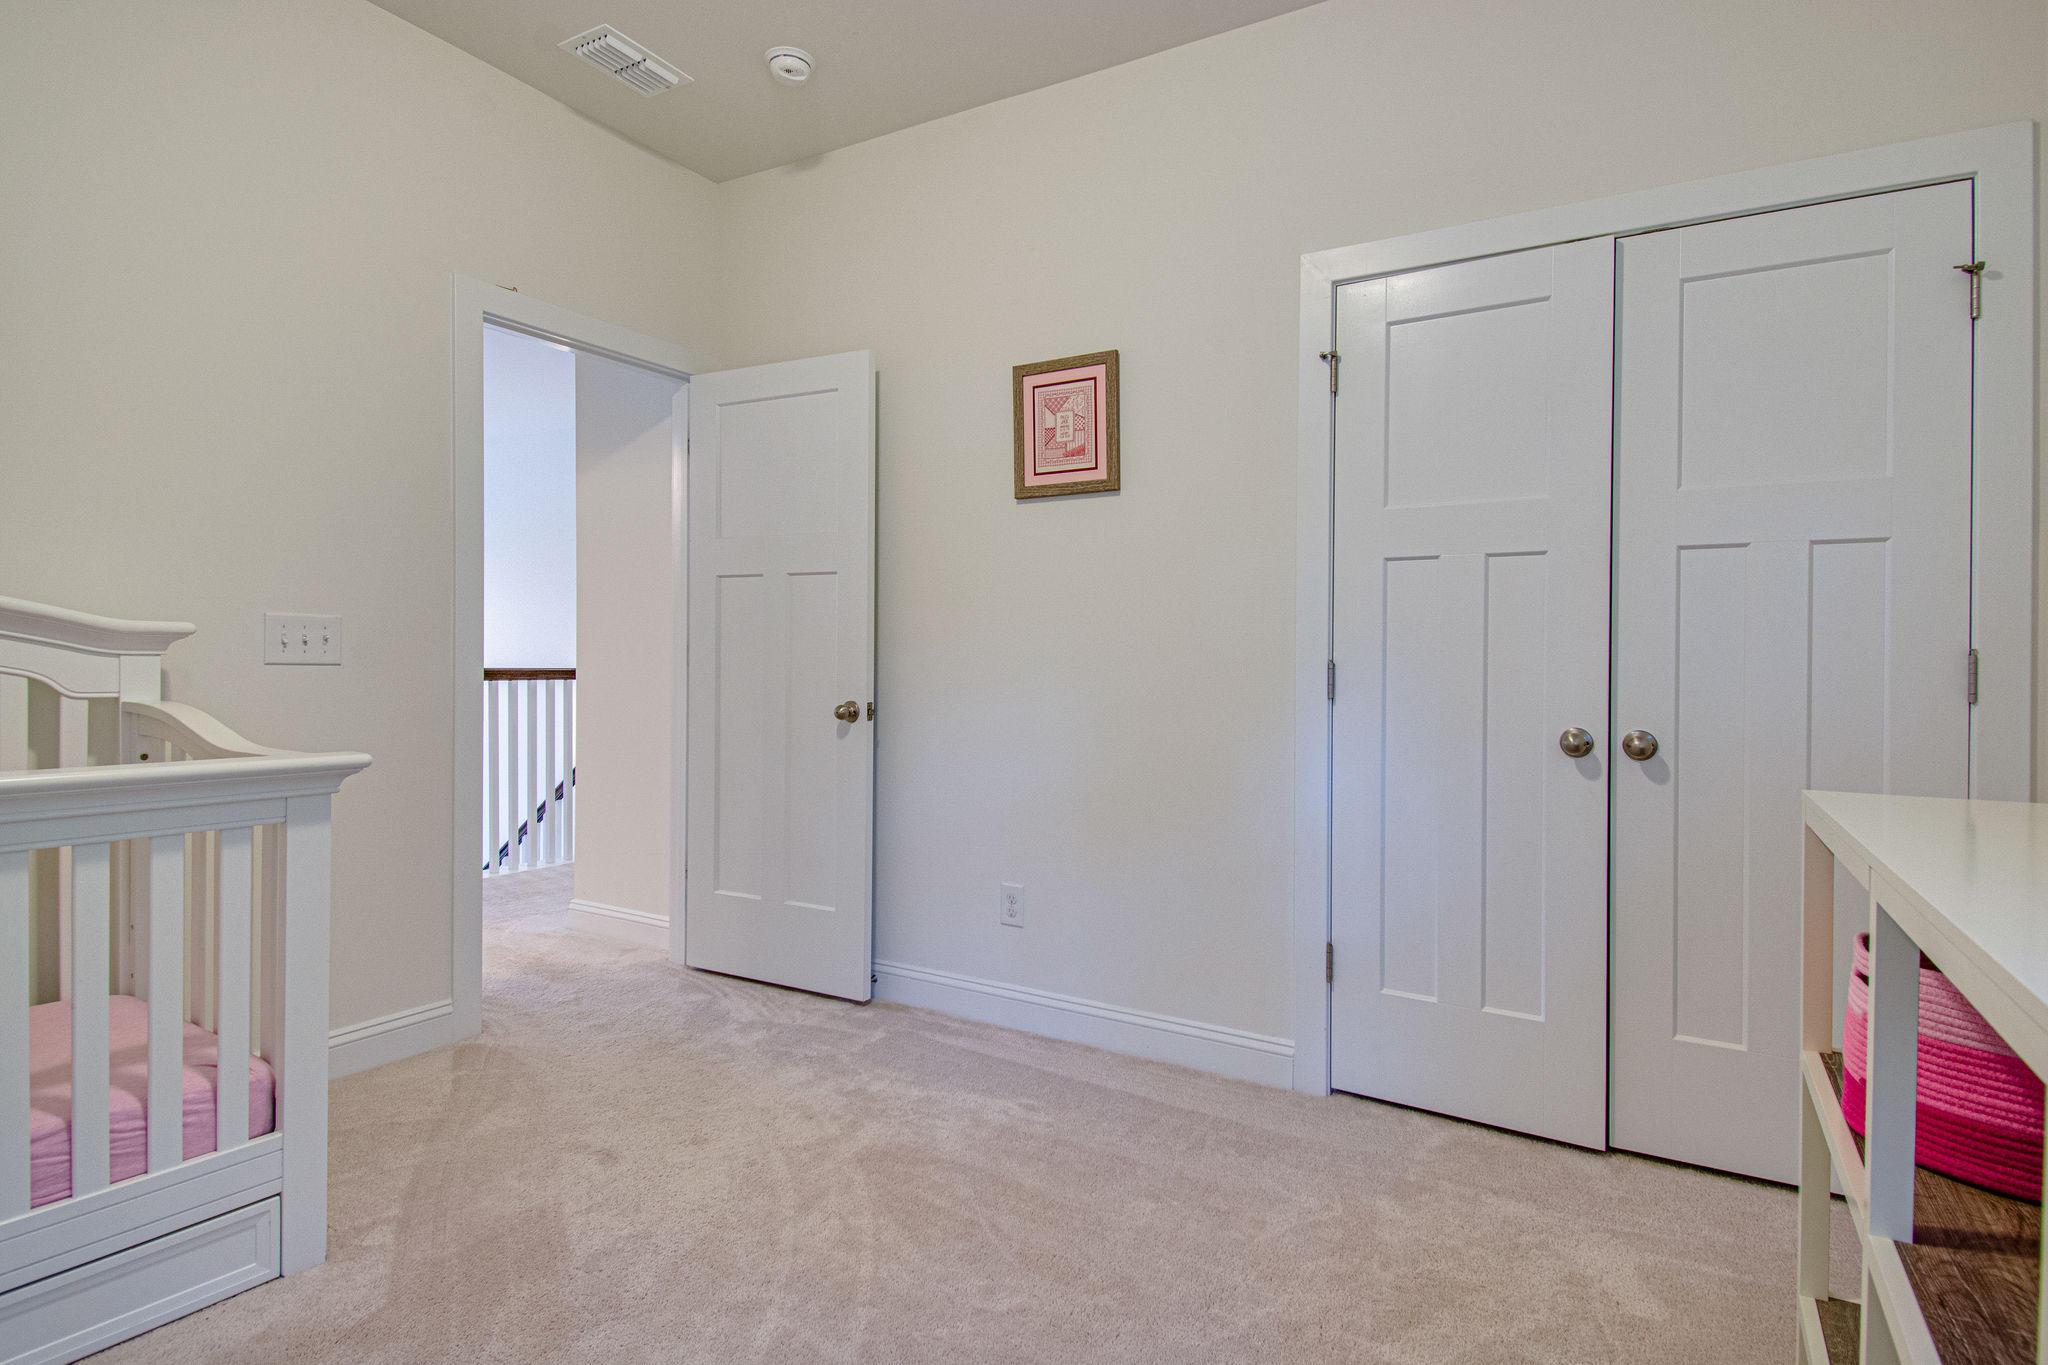 Magnolia Village Homes For Sale - 1261 Pearwood, Mount Pleasant, SC - 22